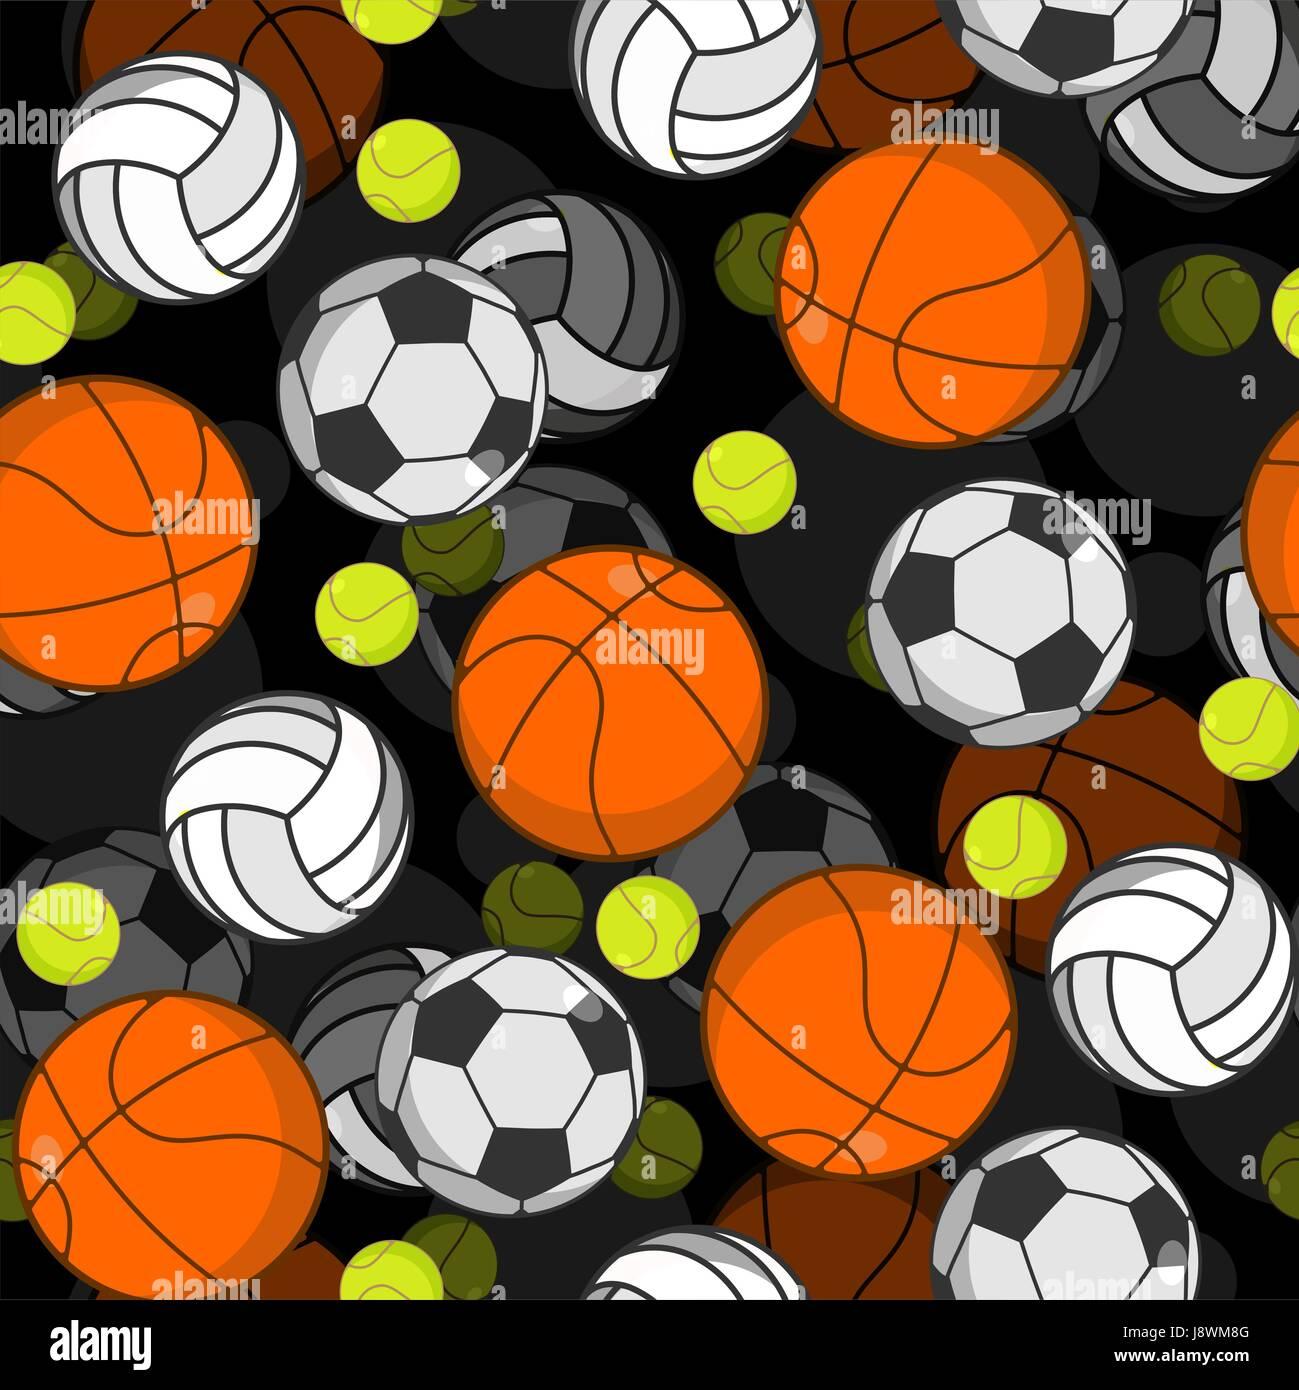 Sports ball 3d seamless pattern. Balls decoration. Basketball and